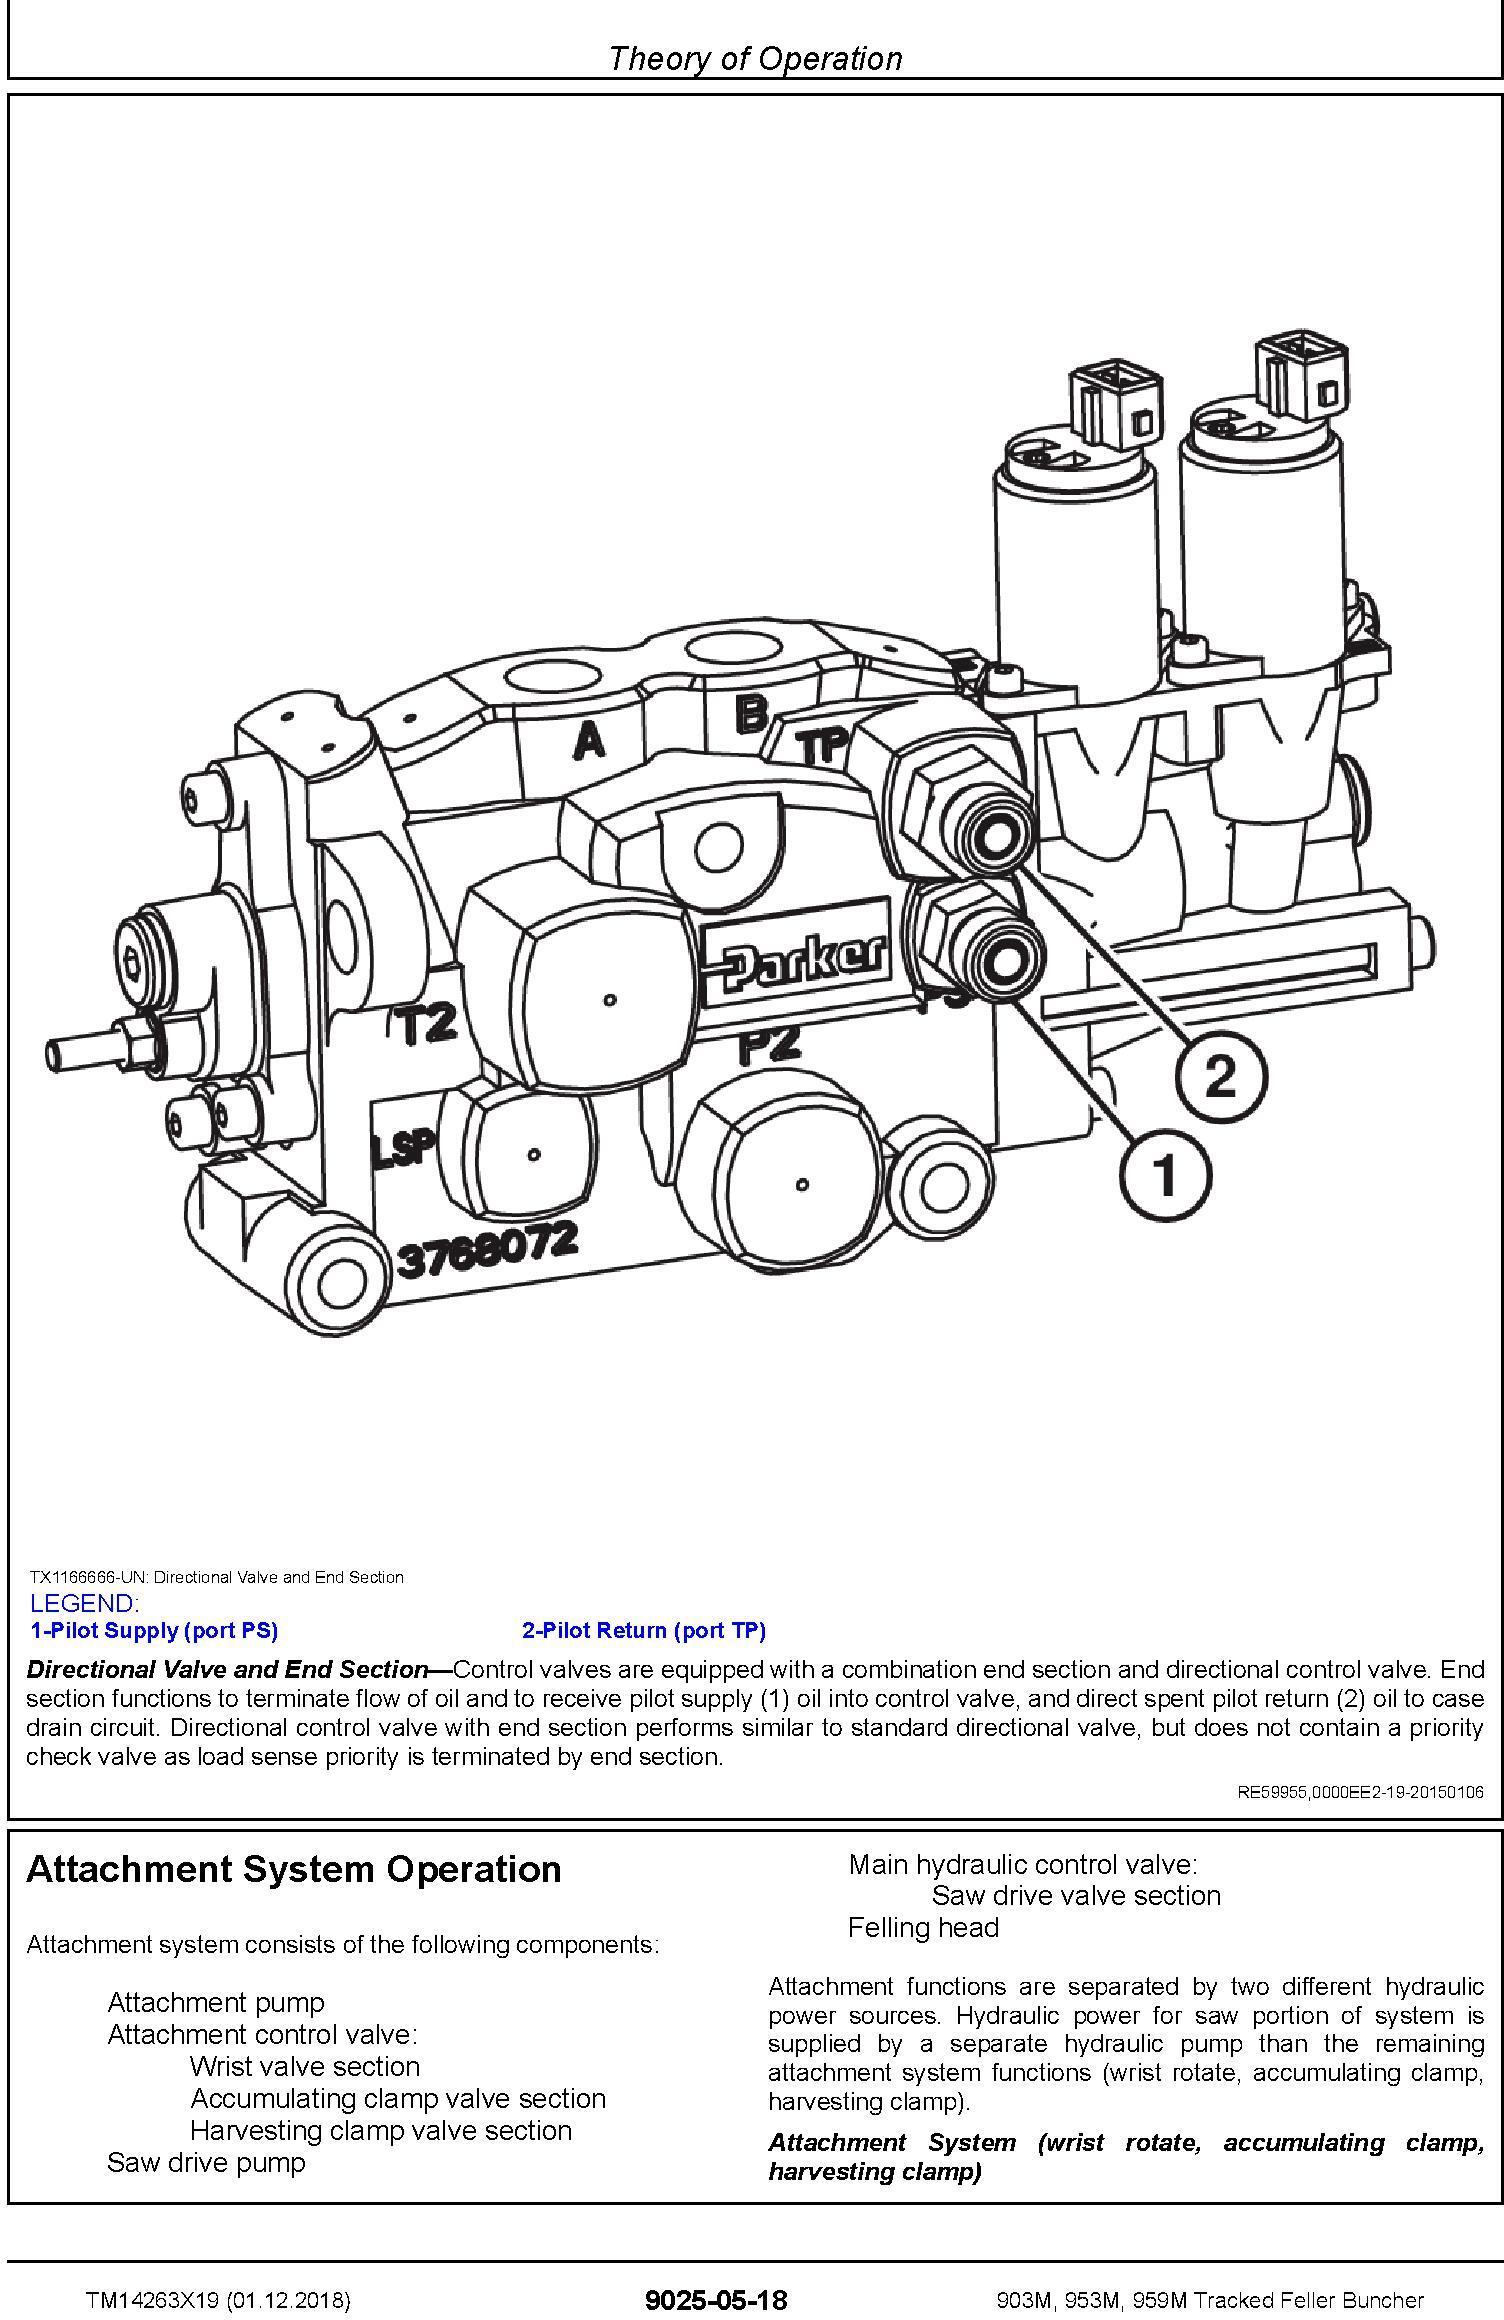 John Deere 903M,953M,959M (SN.C317982-,D317982-) Feller Buncher Diagnostic Service Manual TM14263X19 - 3